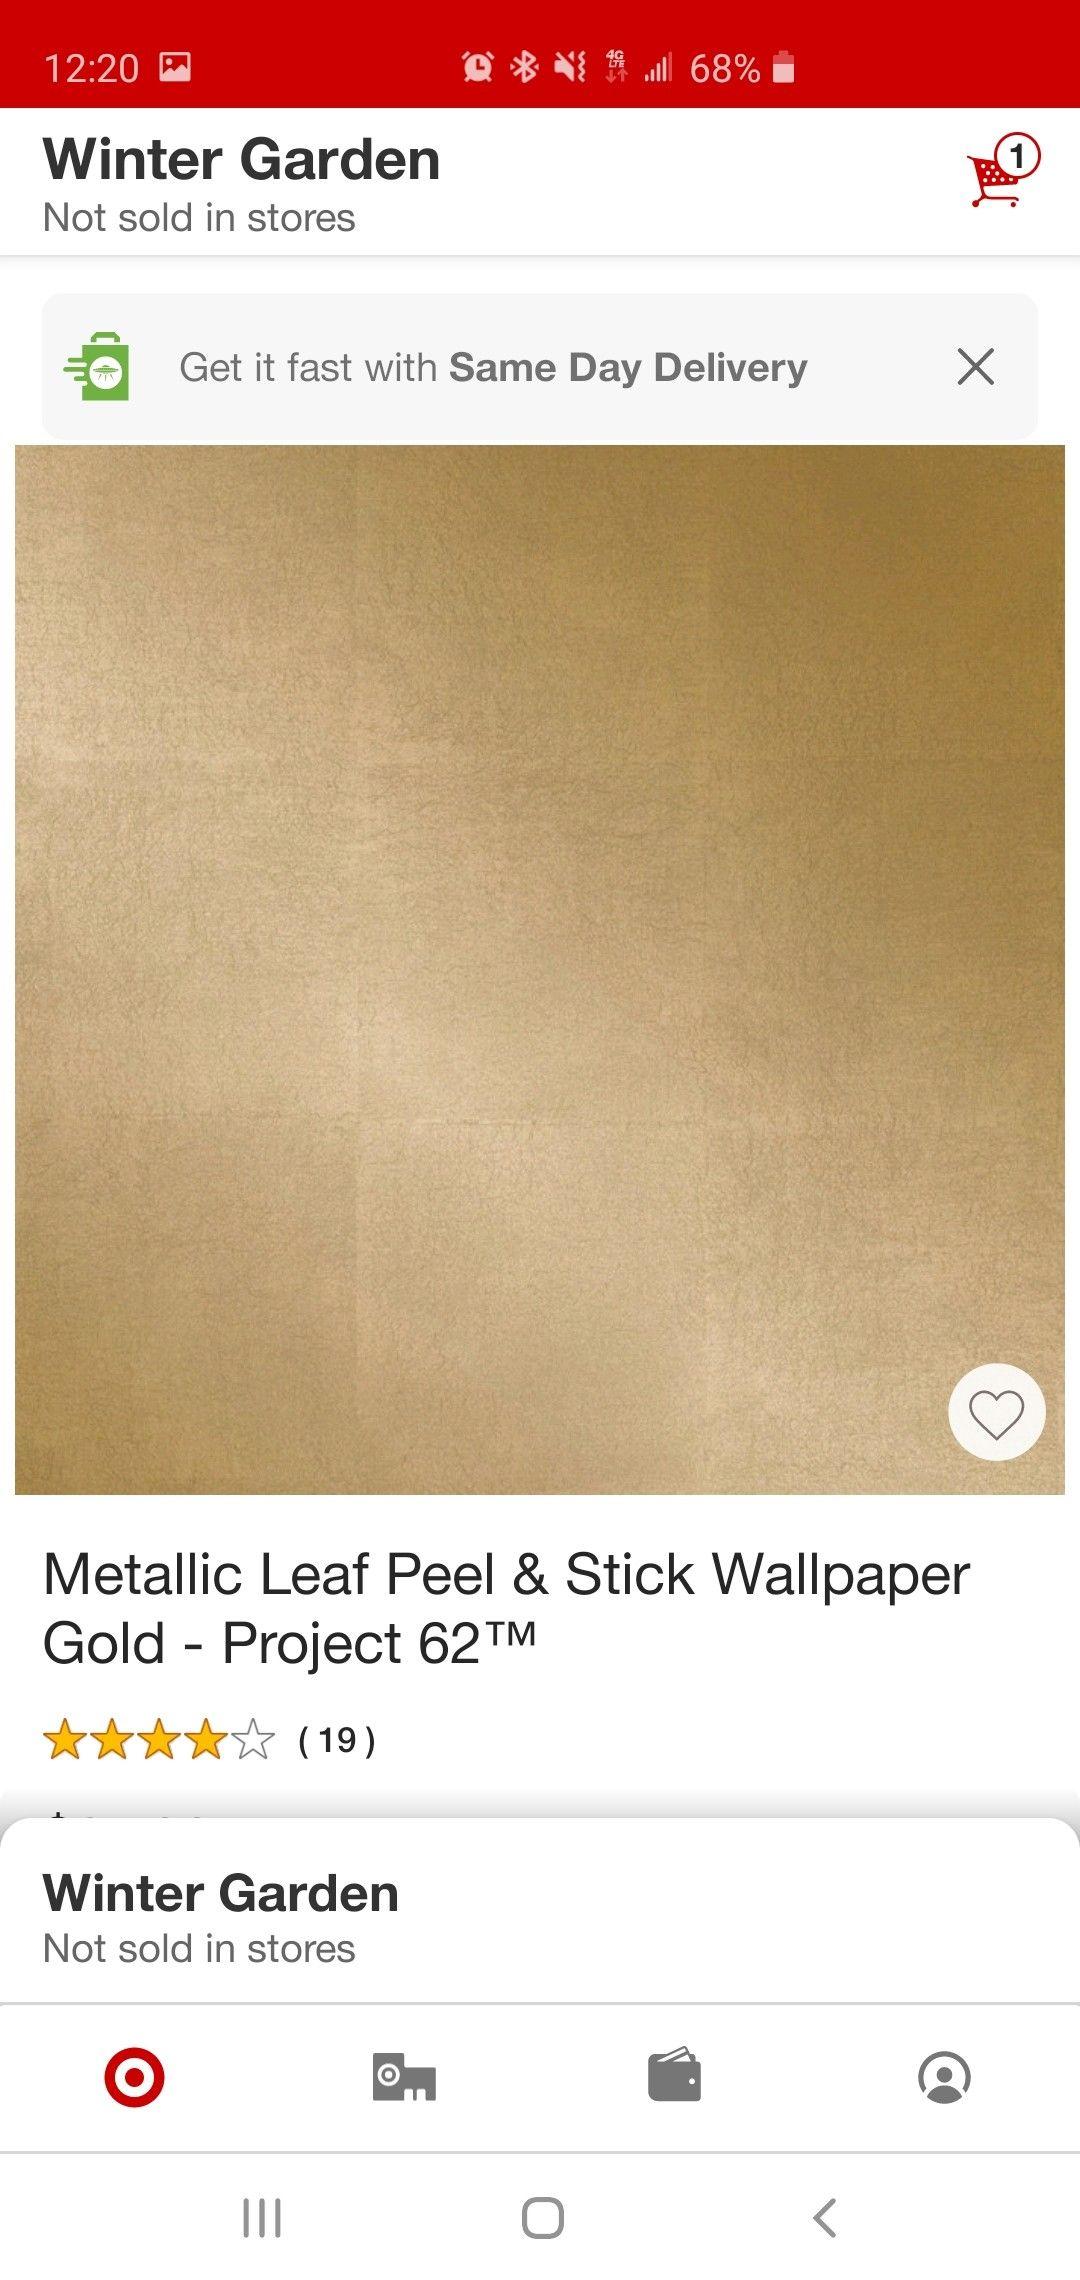 Wall Waist Height Border Peel And Stick Wallpaper Winter Garden How To Get